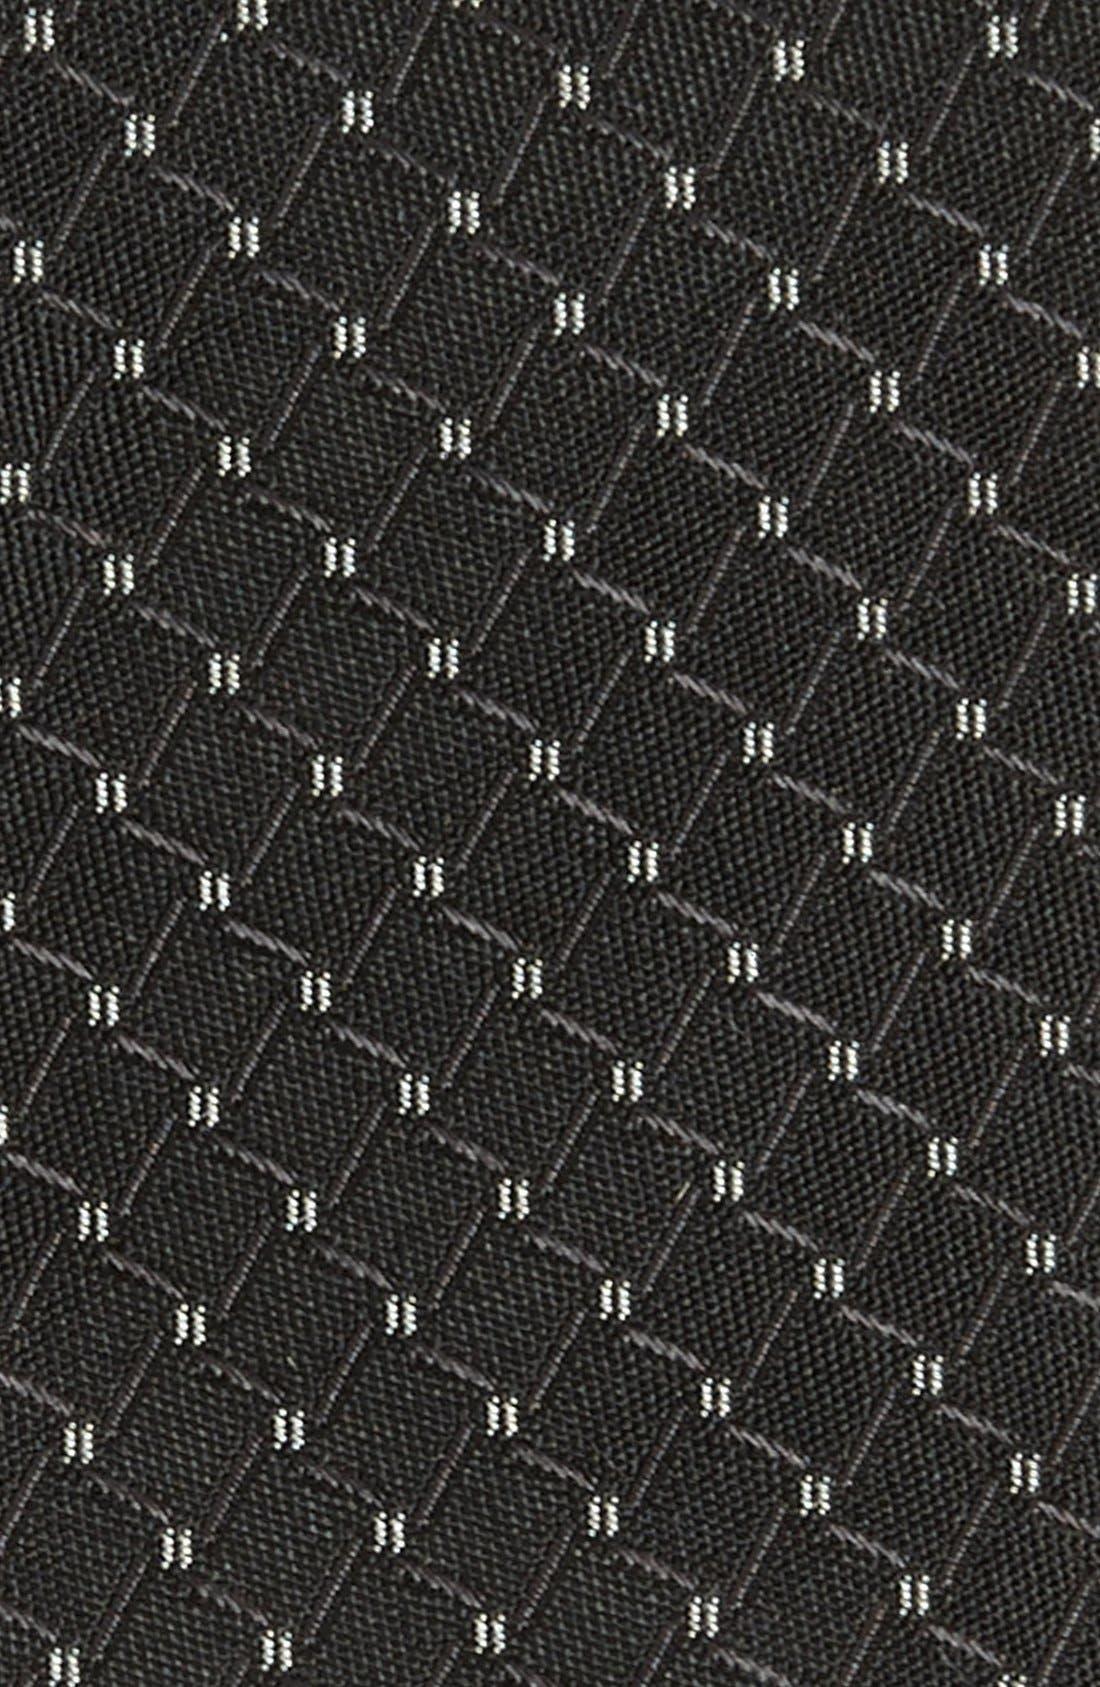 Alternate Image 2  - Dolce&Gabbana Martini Weave Silk Tie